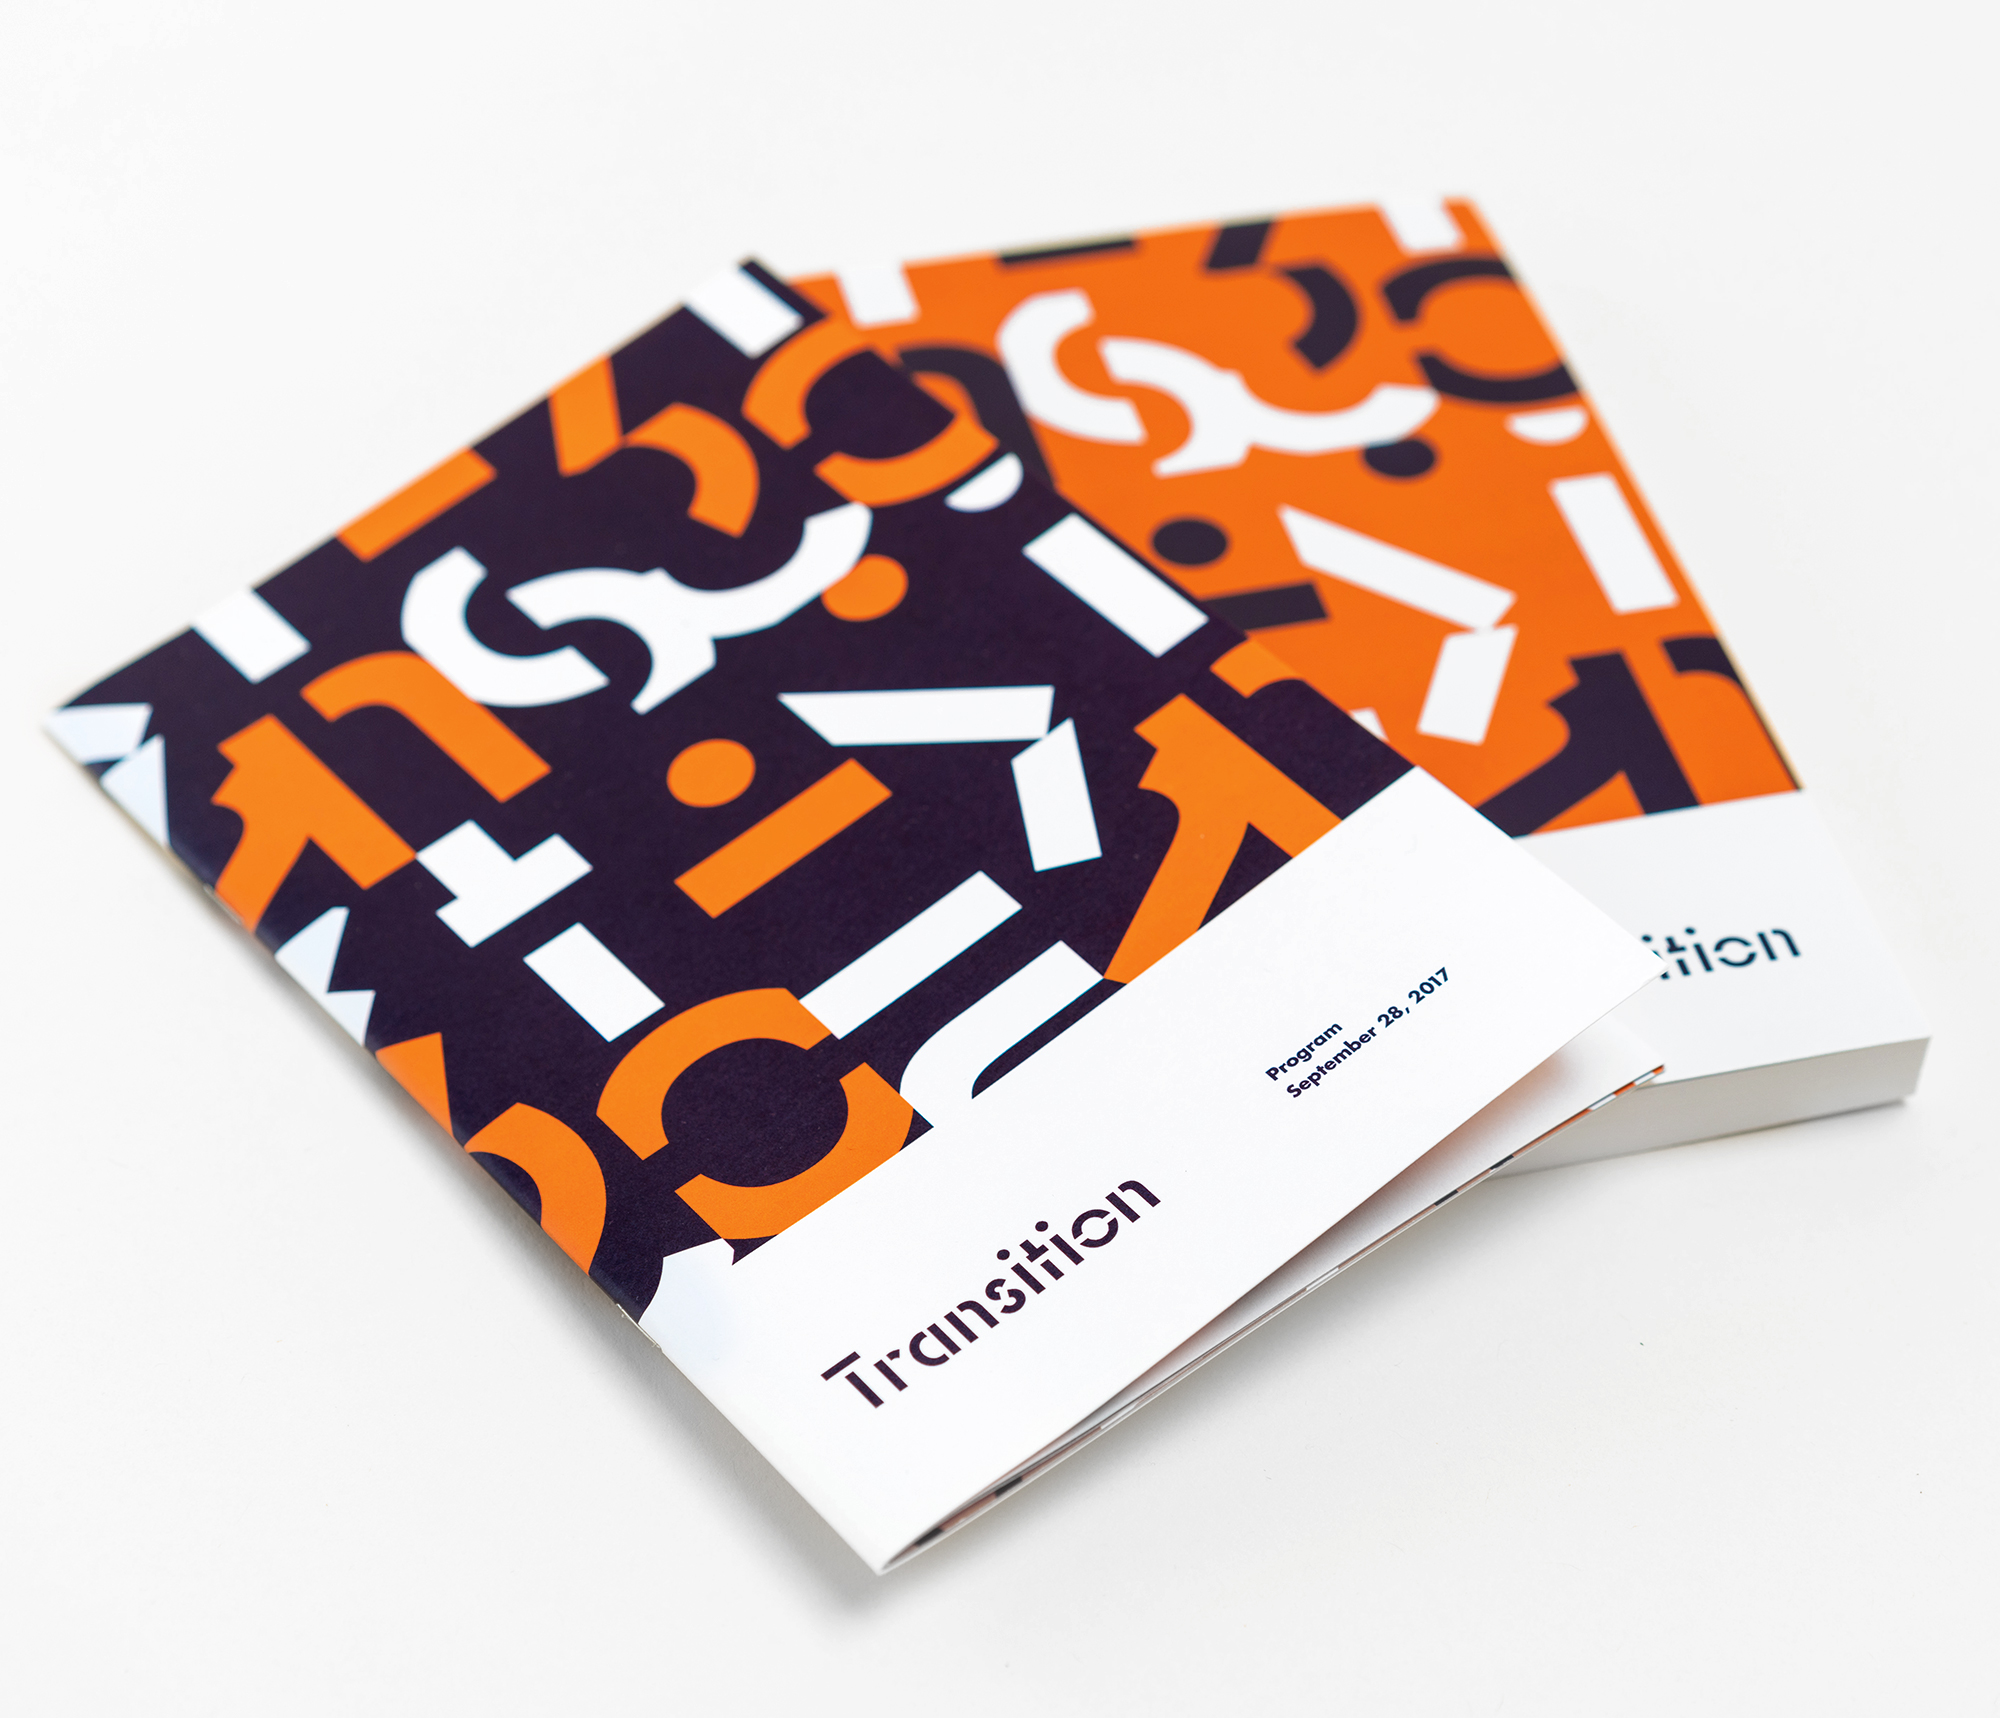 transition_books.jpg